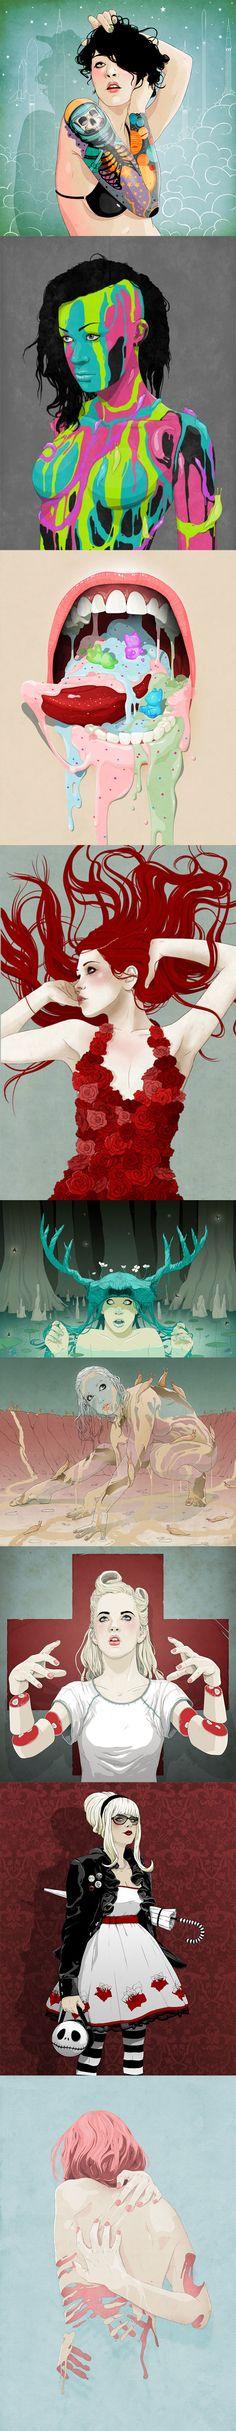 Illustrations by Stuntkid (Jason Levesque)